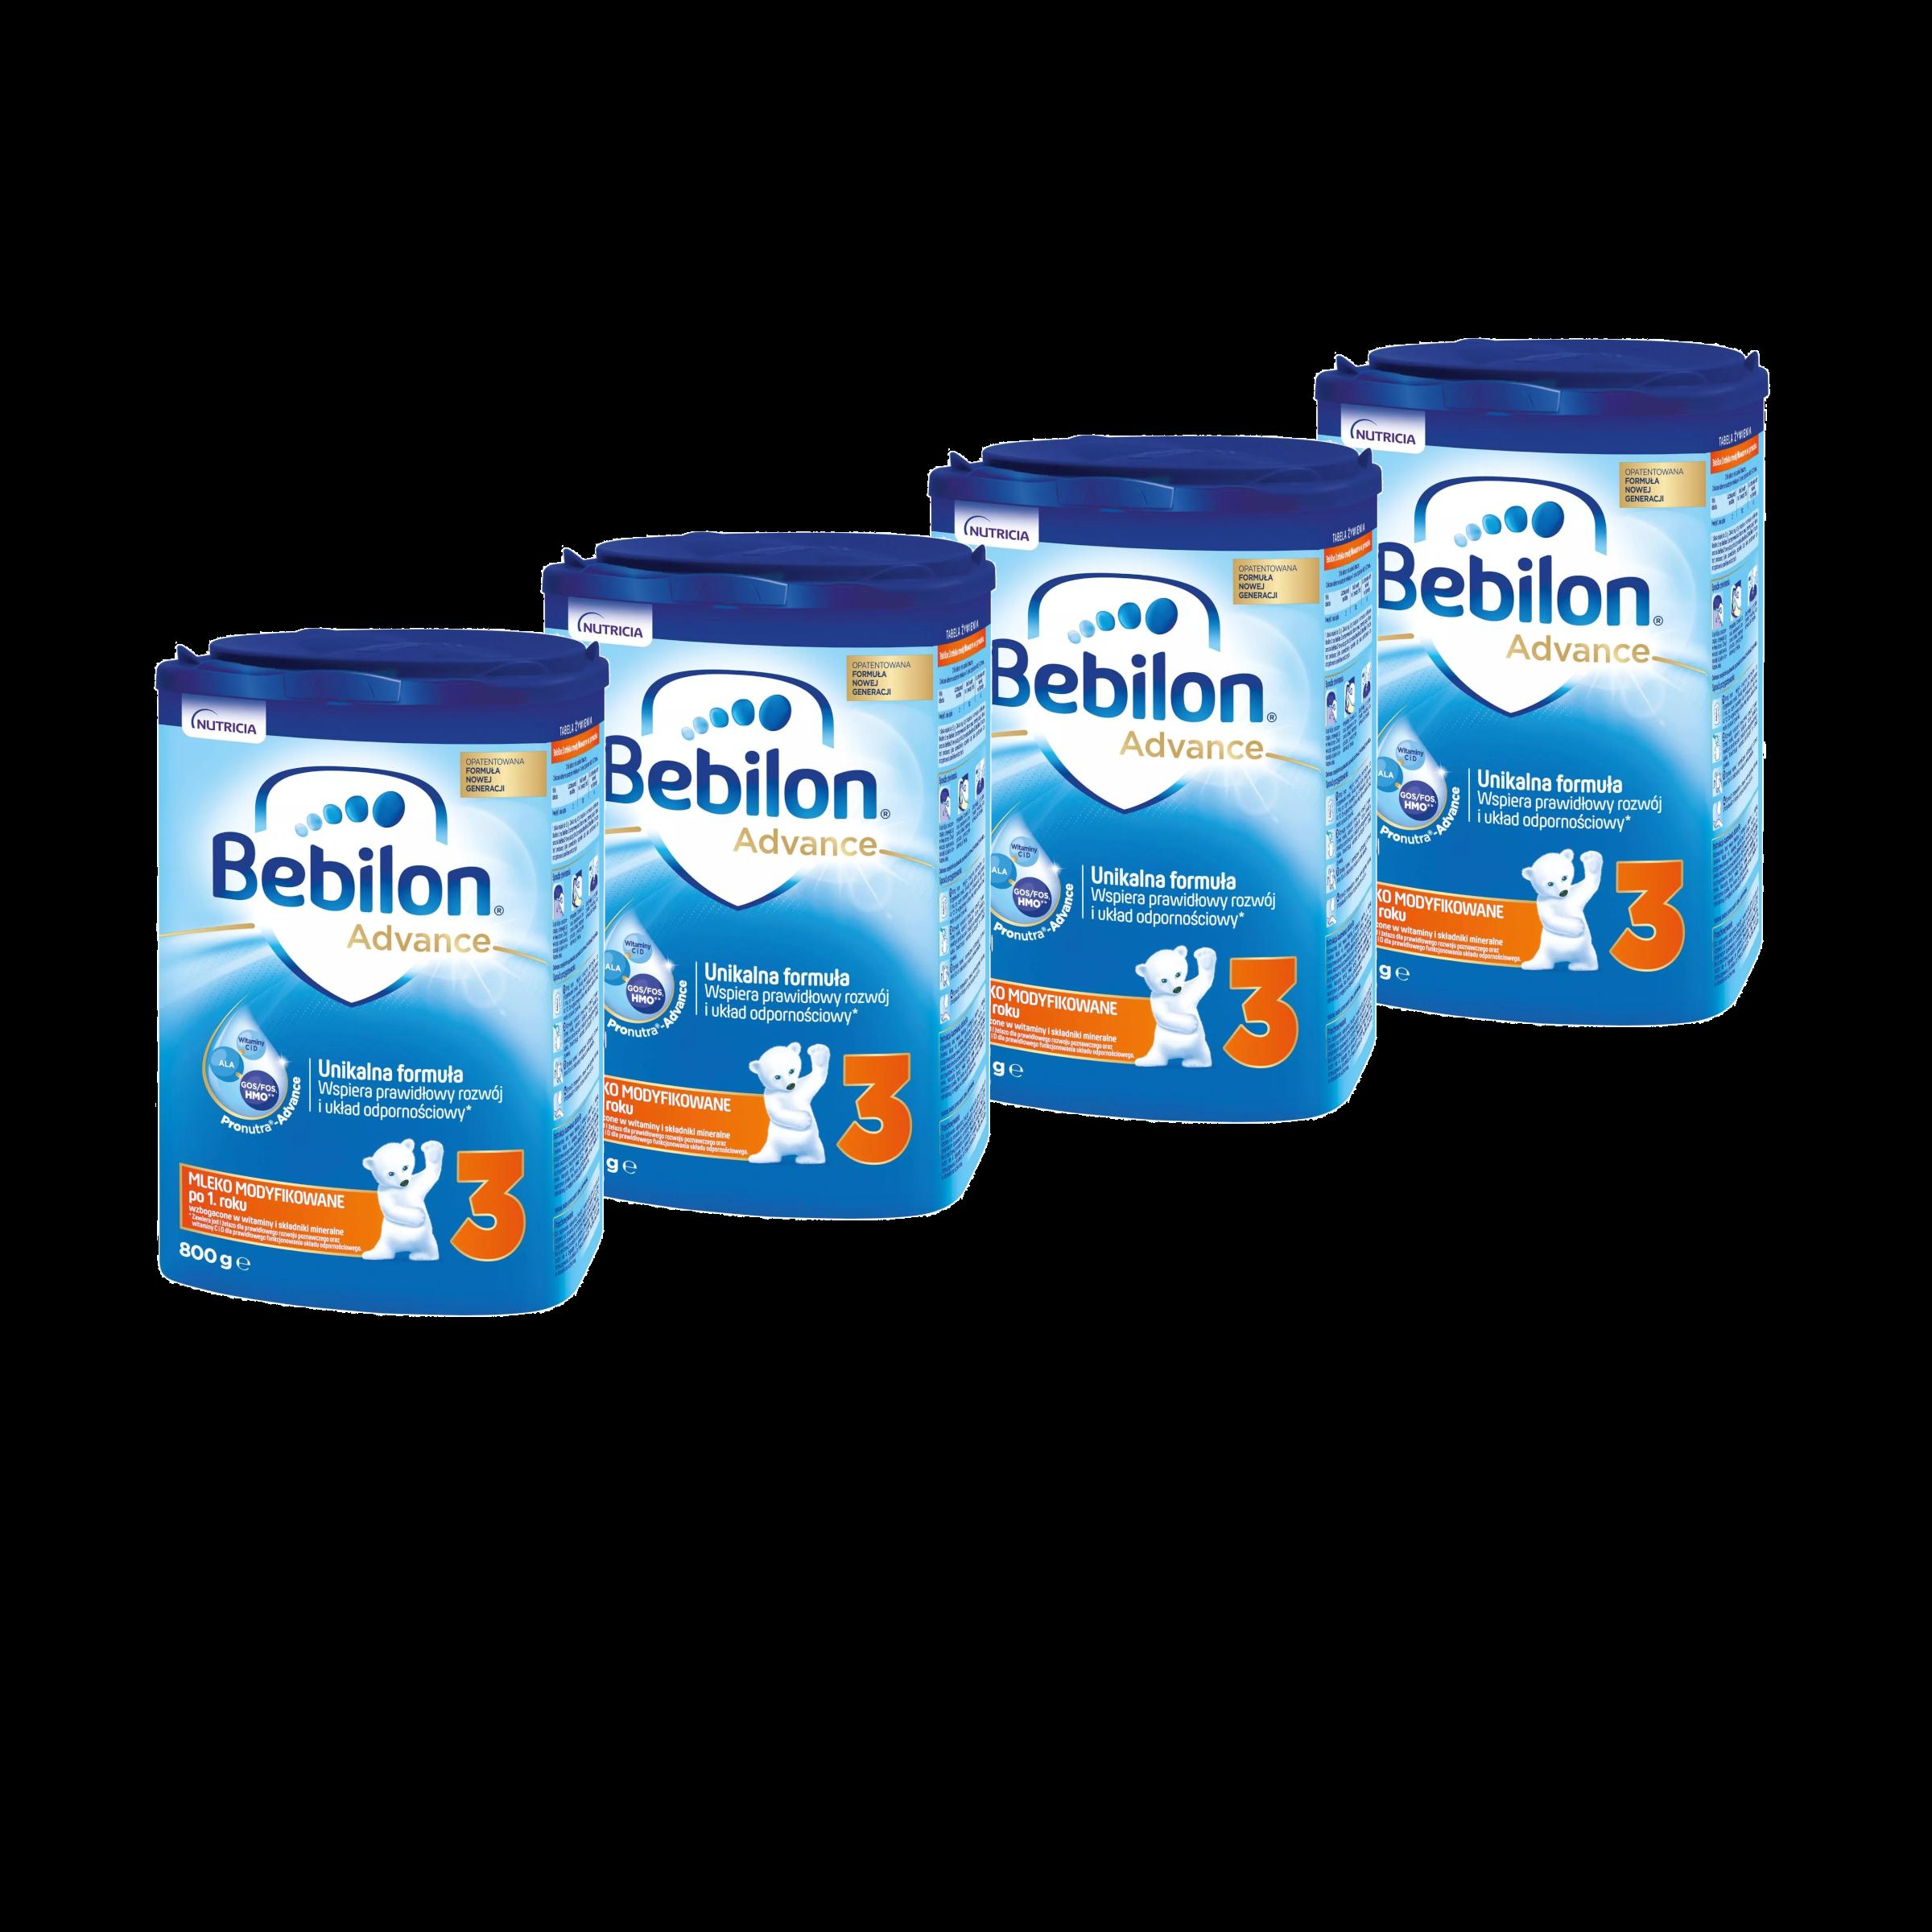 bebilon3_800_4pak